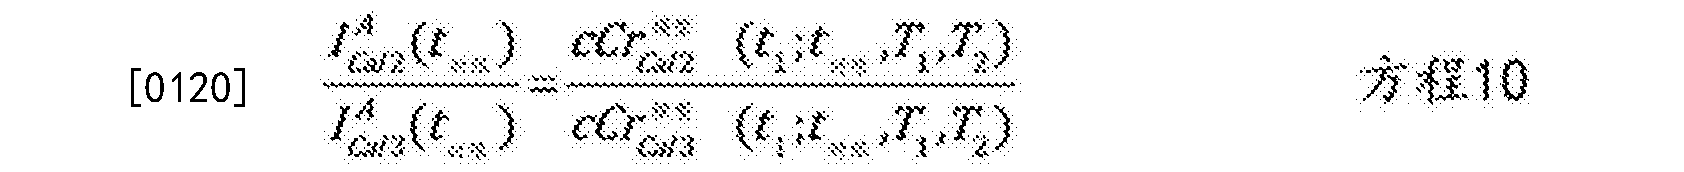 Figure CN107110815AD00122